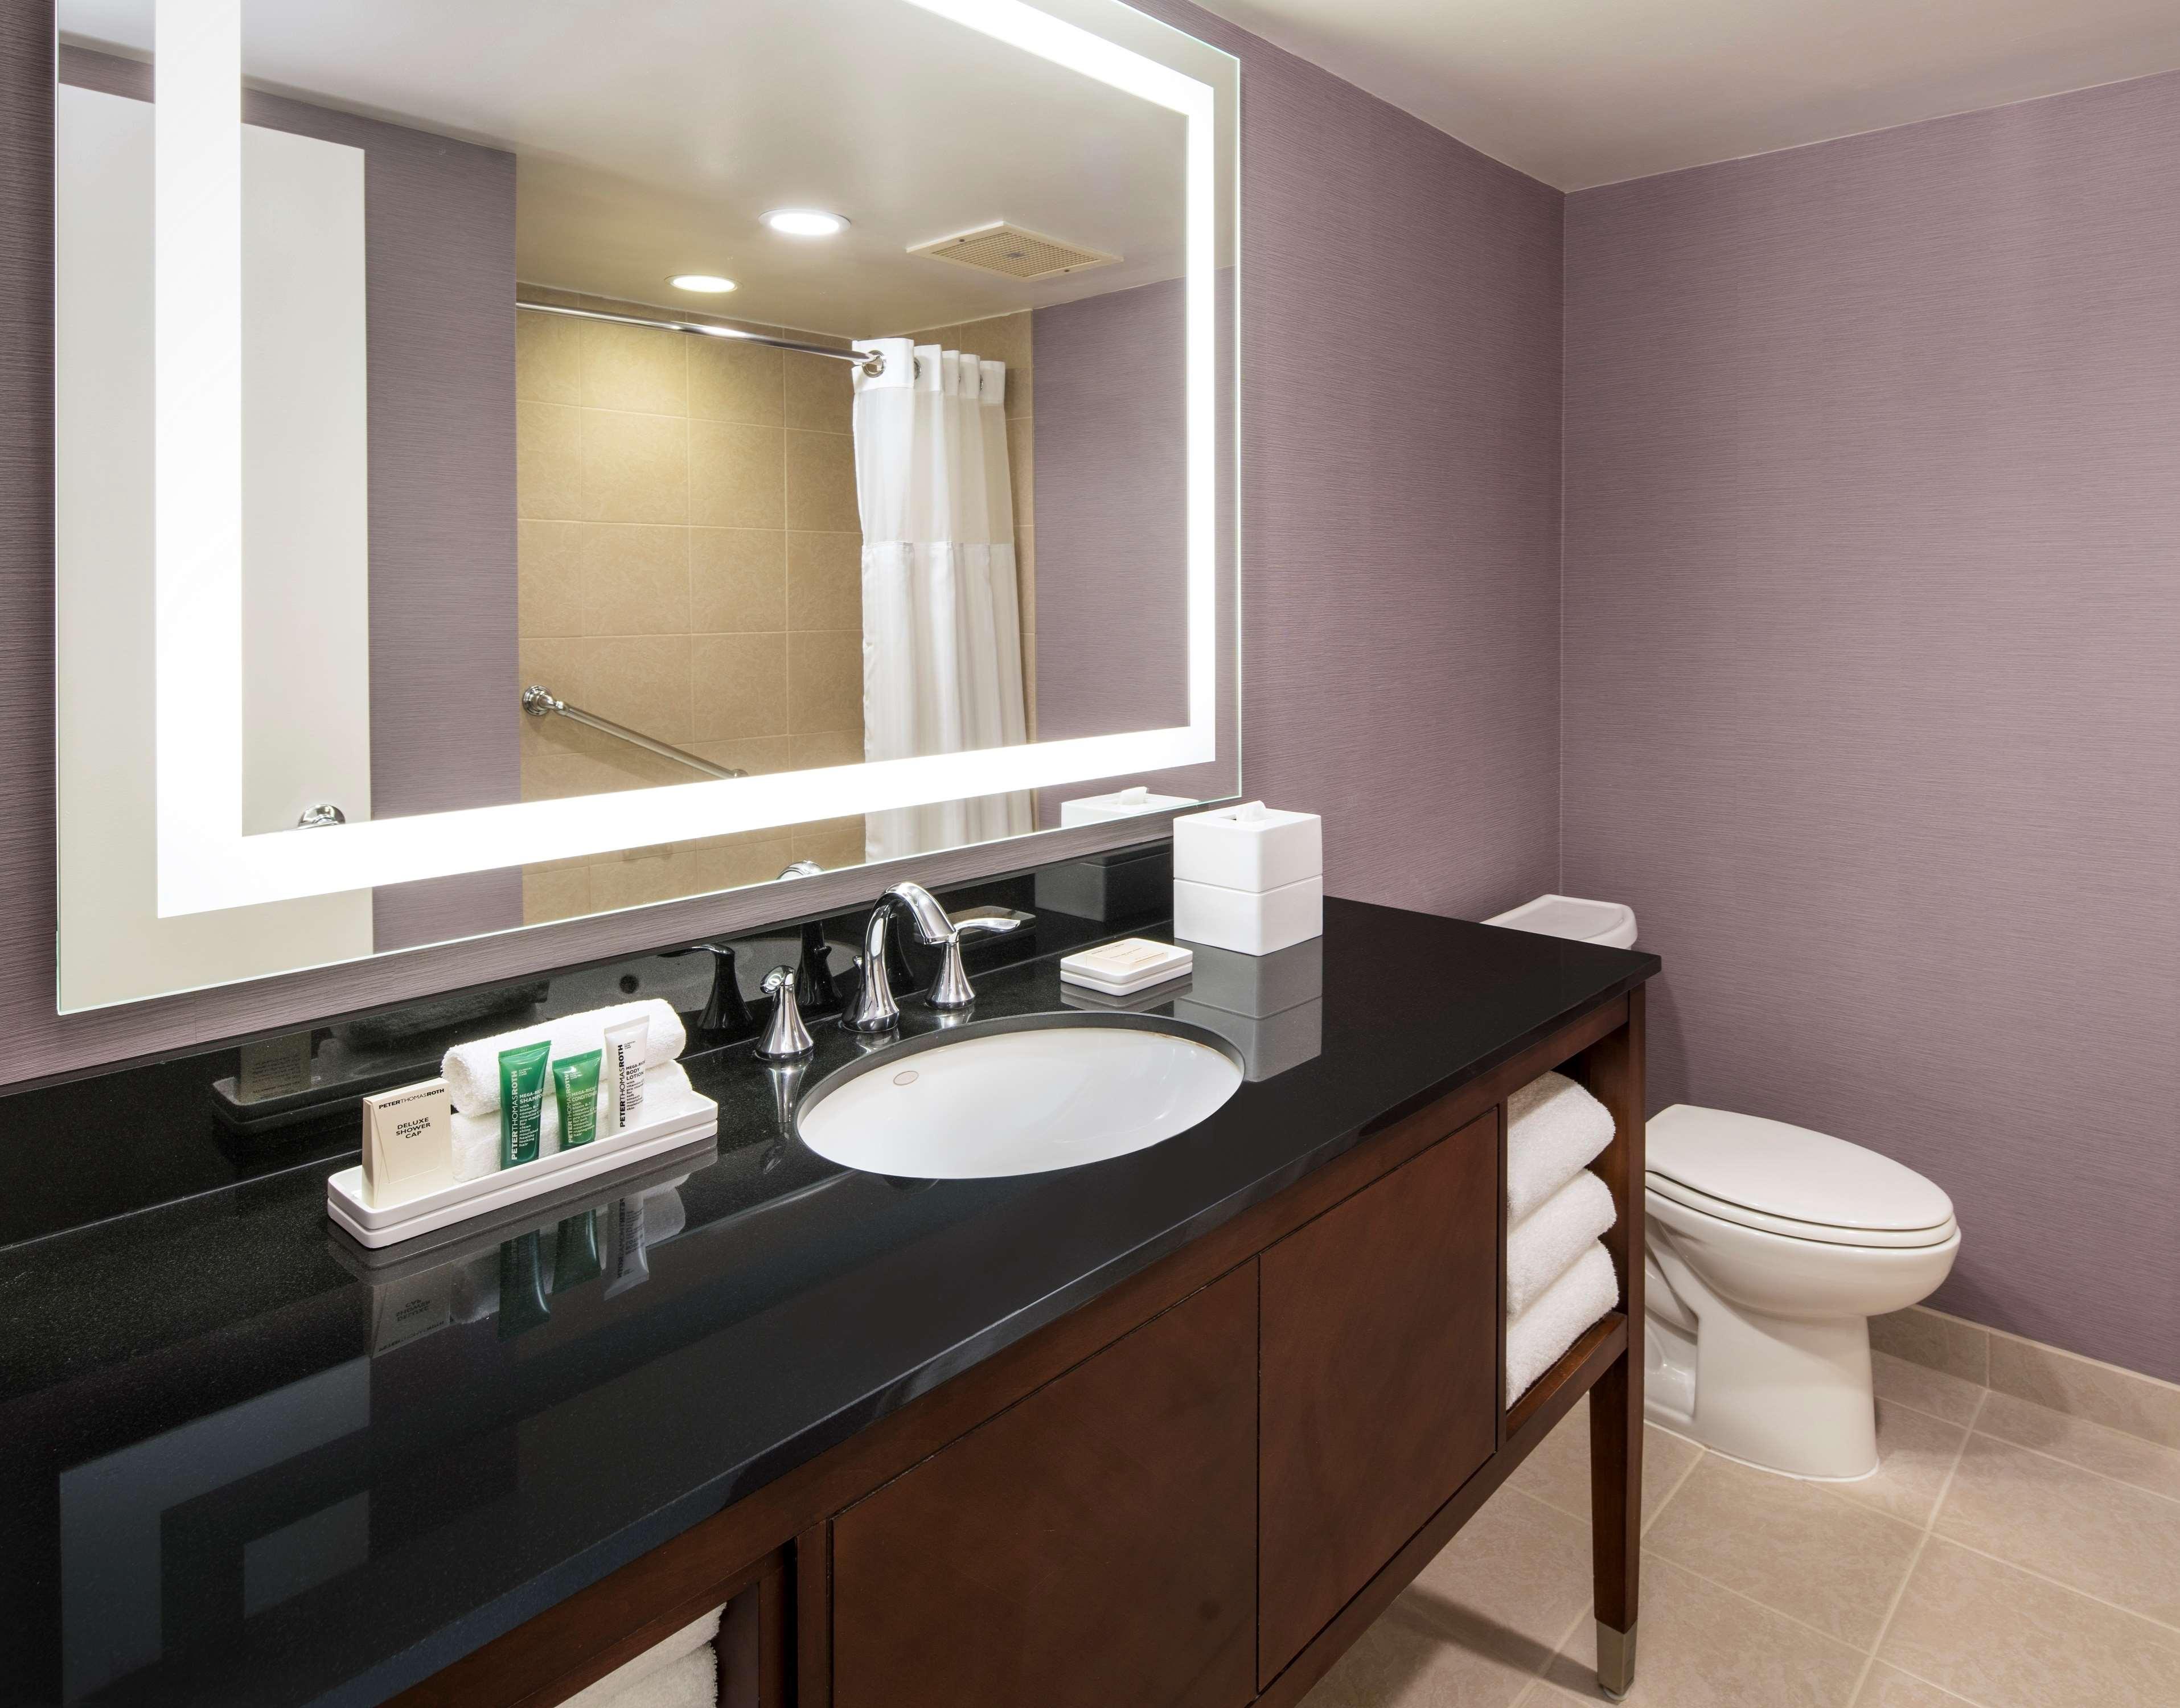 Hilton Washington DC/Rockville Hotel & Executive Meeting Ctr image 38